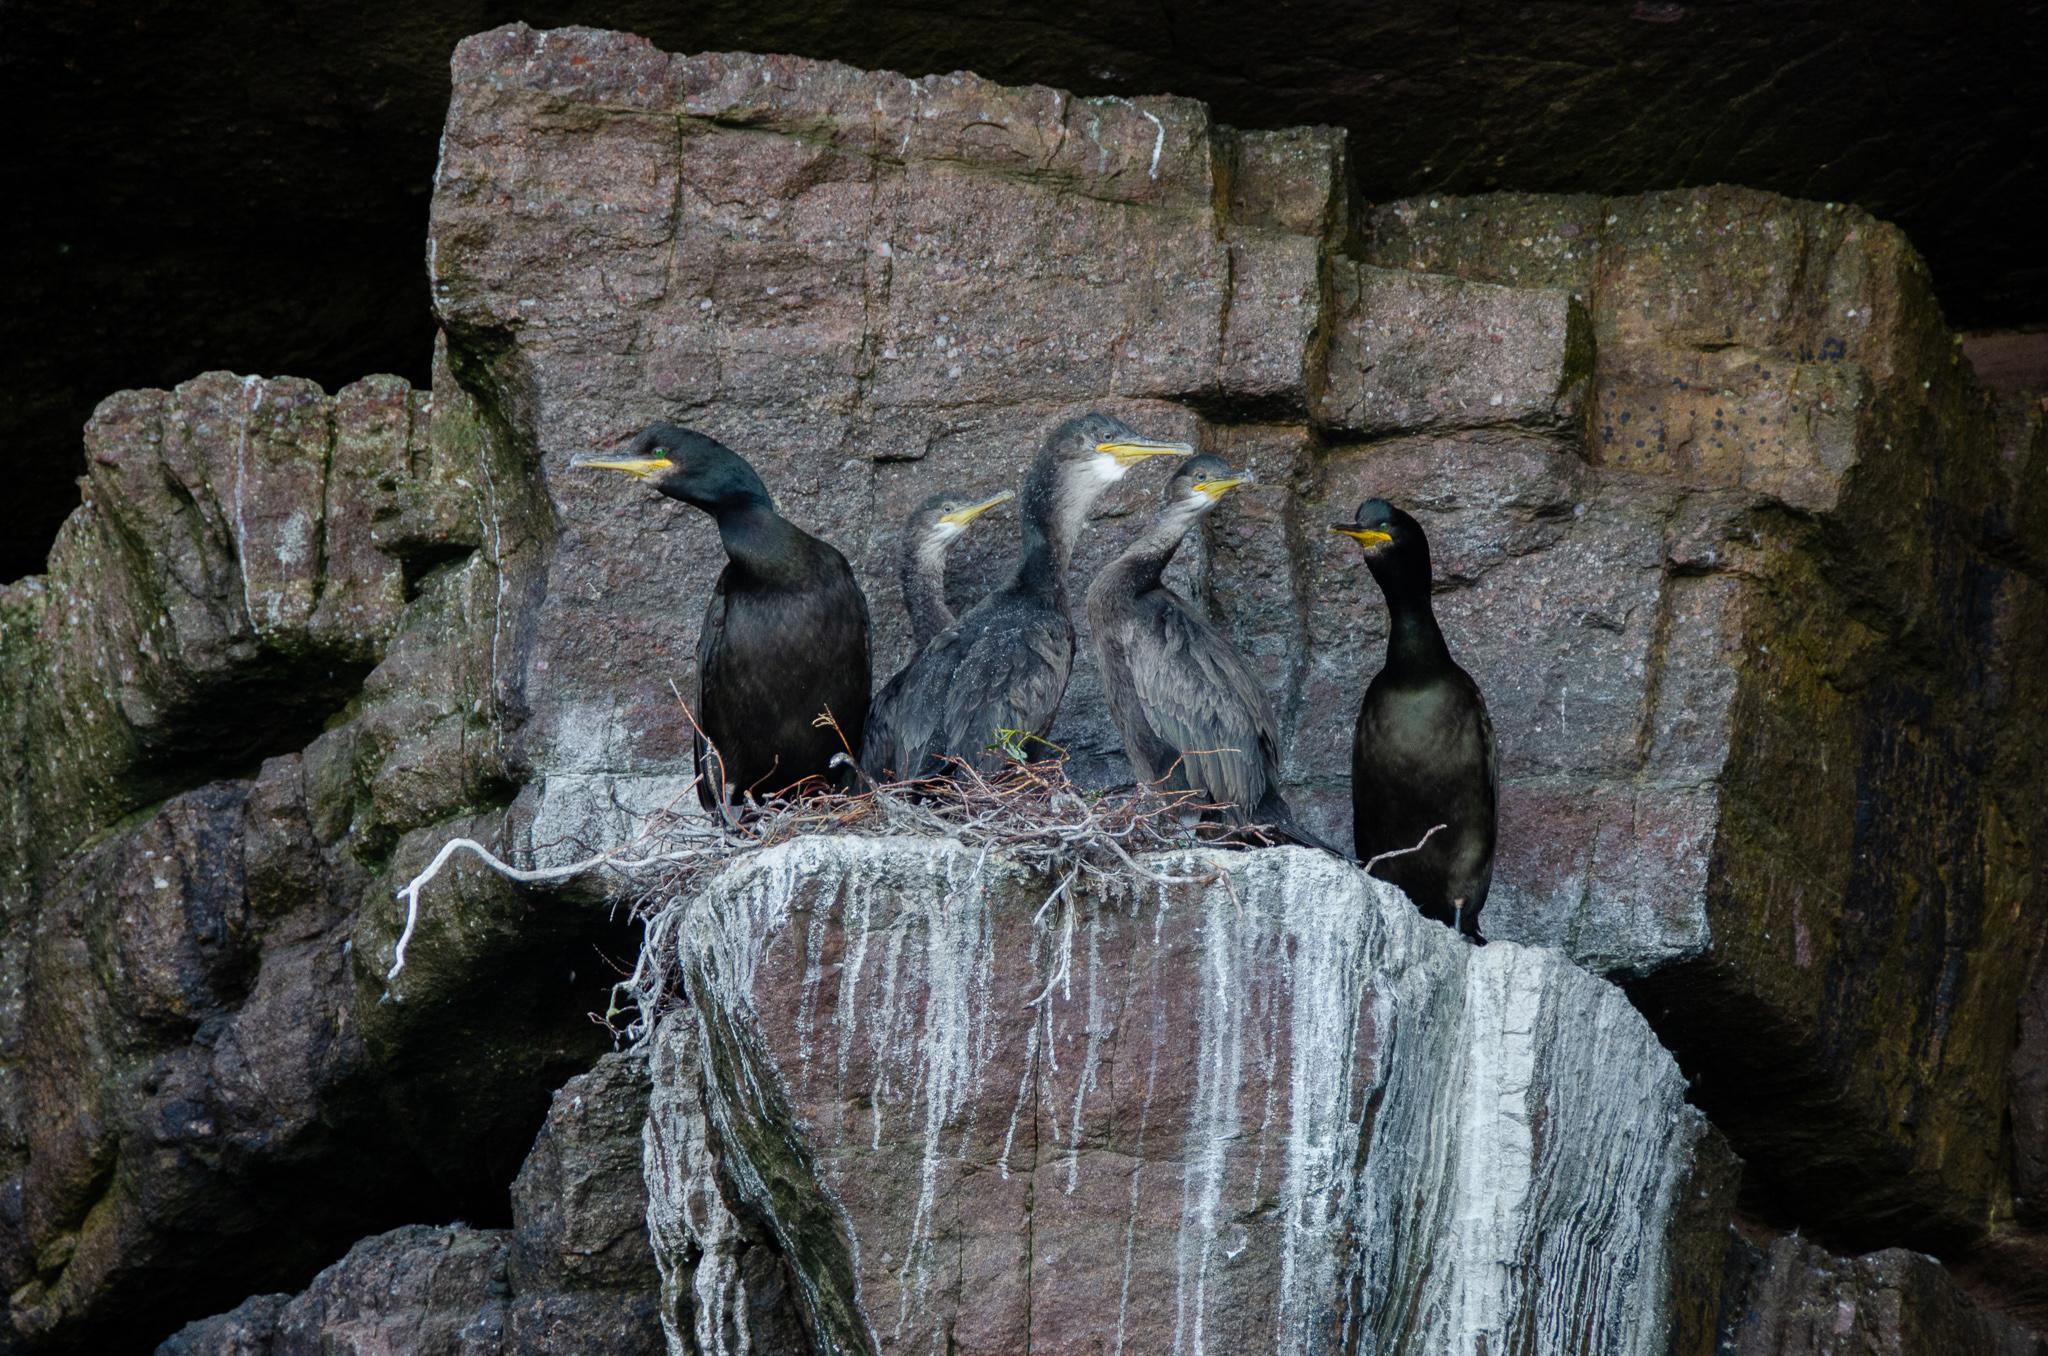 The cormorant family